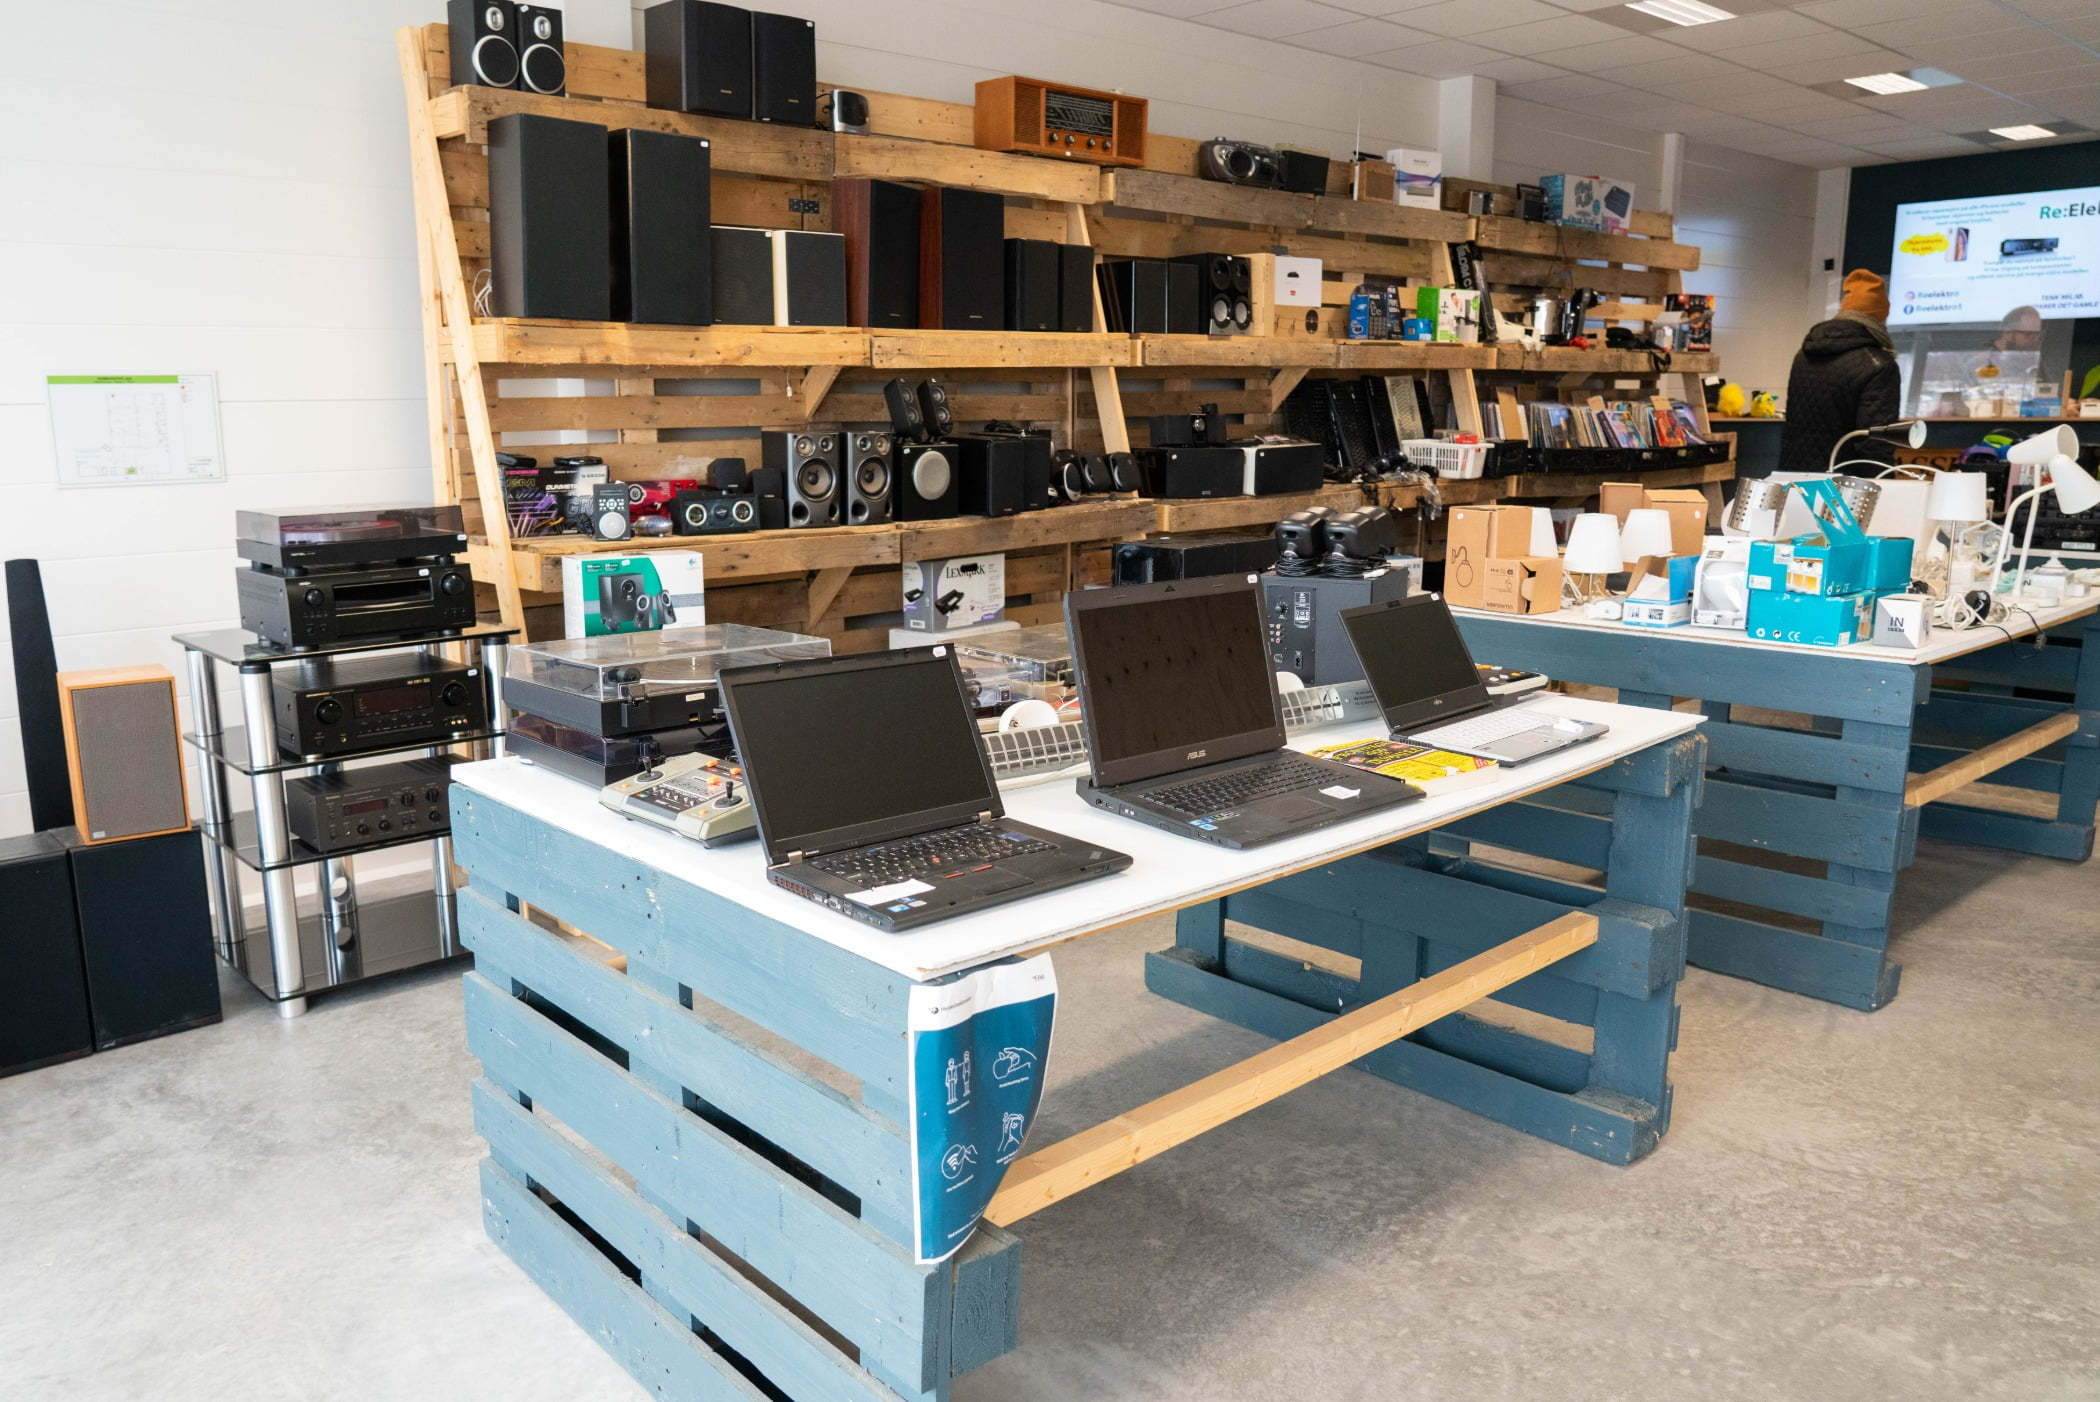 Personal computer, Table, Furniture, Desk, Laptop, Shelf, Shelving